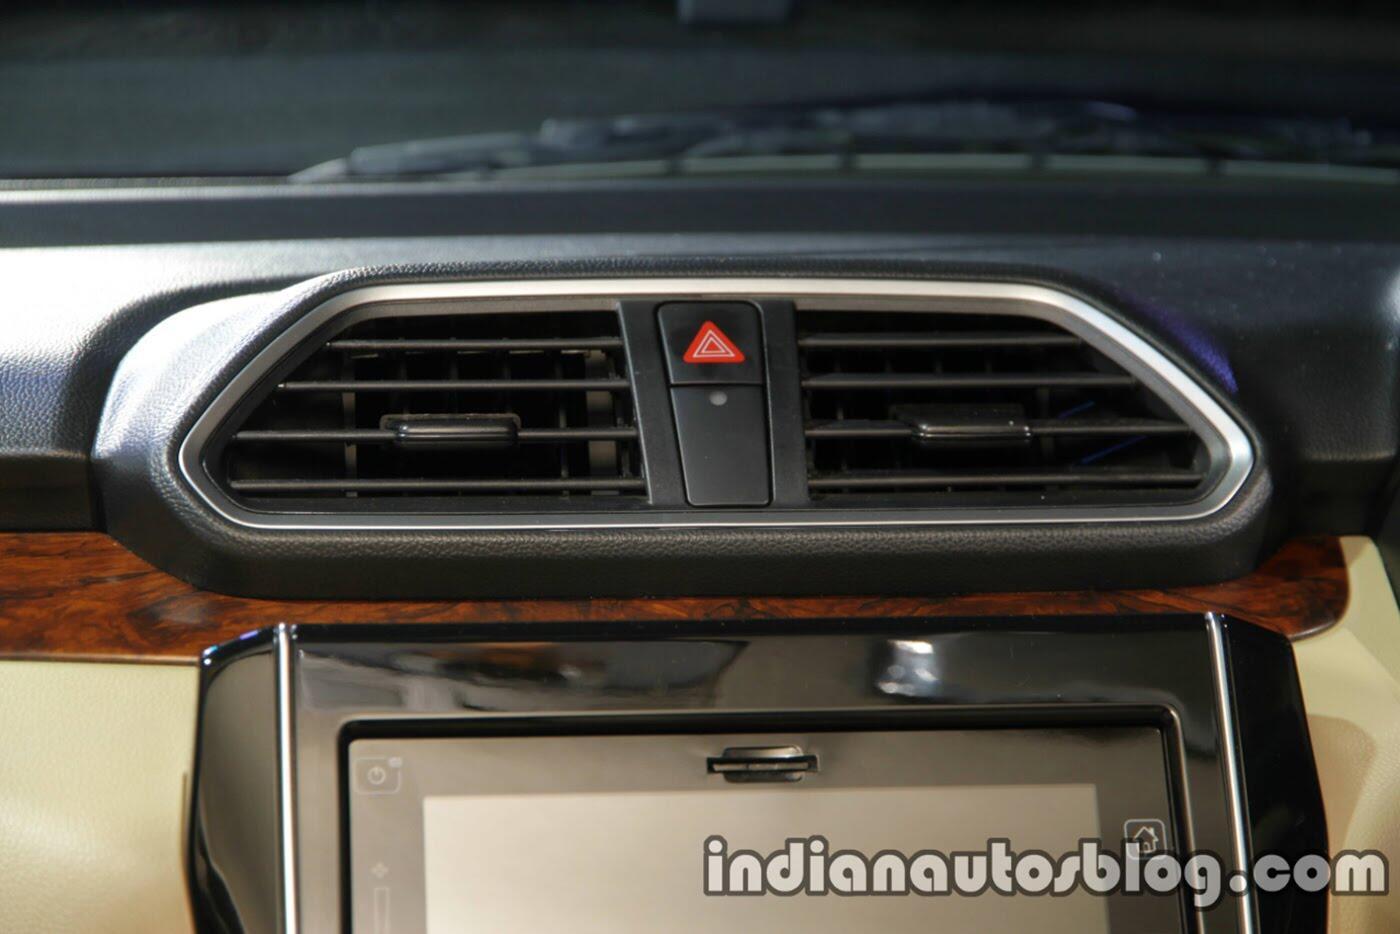 Xem thêm ảnh phiên bản sedan của Suzuki Swift 2018 - Hình 18